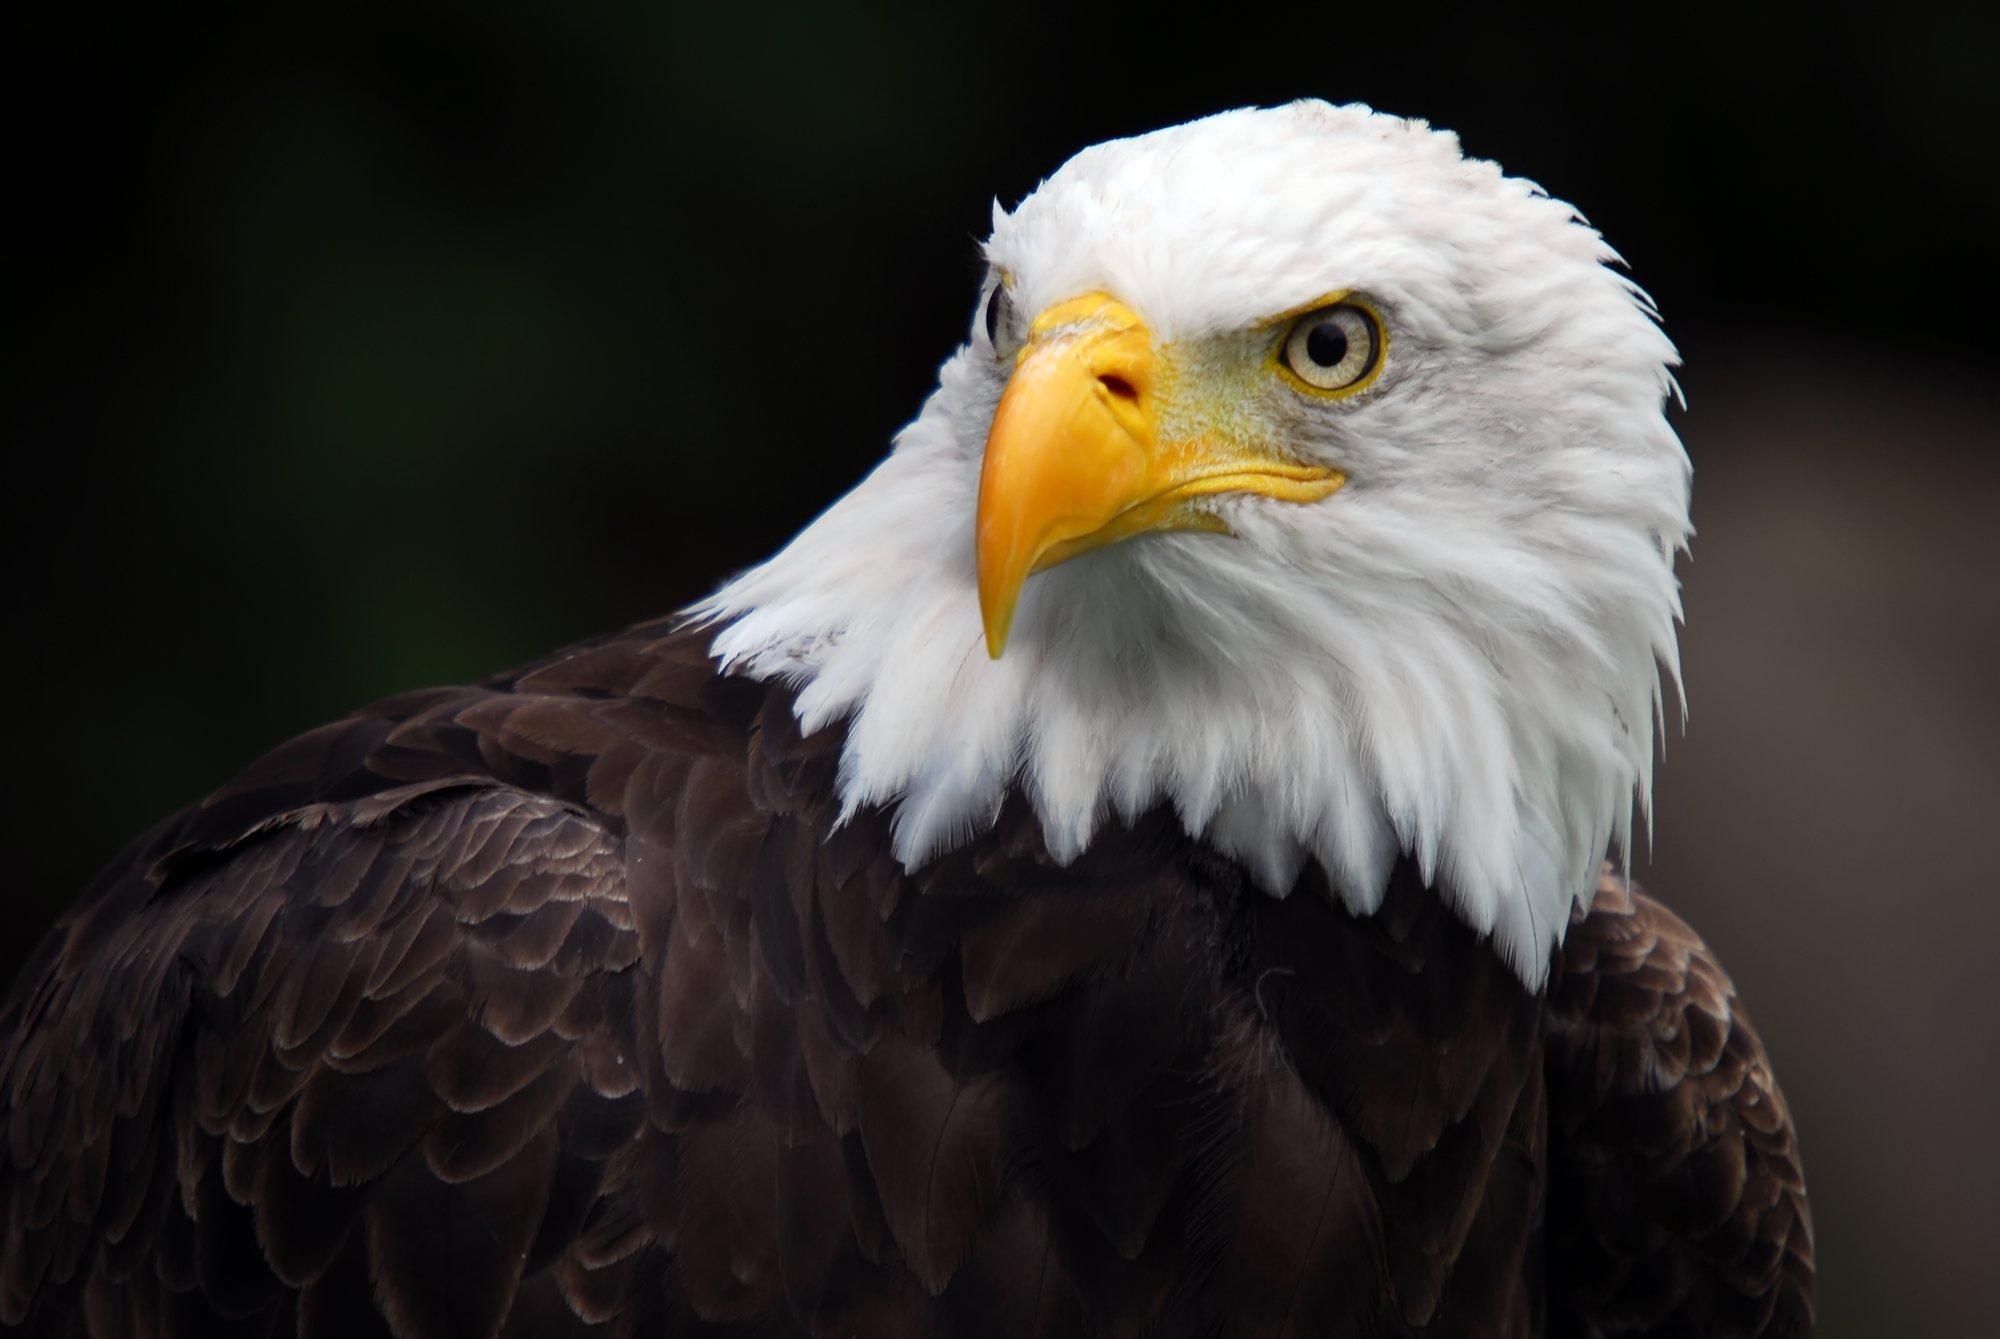 Wallpaper Abyss Explore the Collection Birds Eagles Bald Eagle 403514 2000x1339